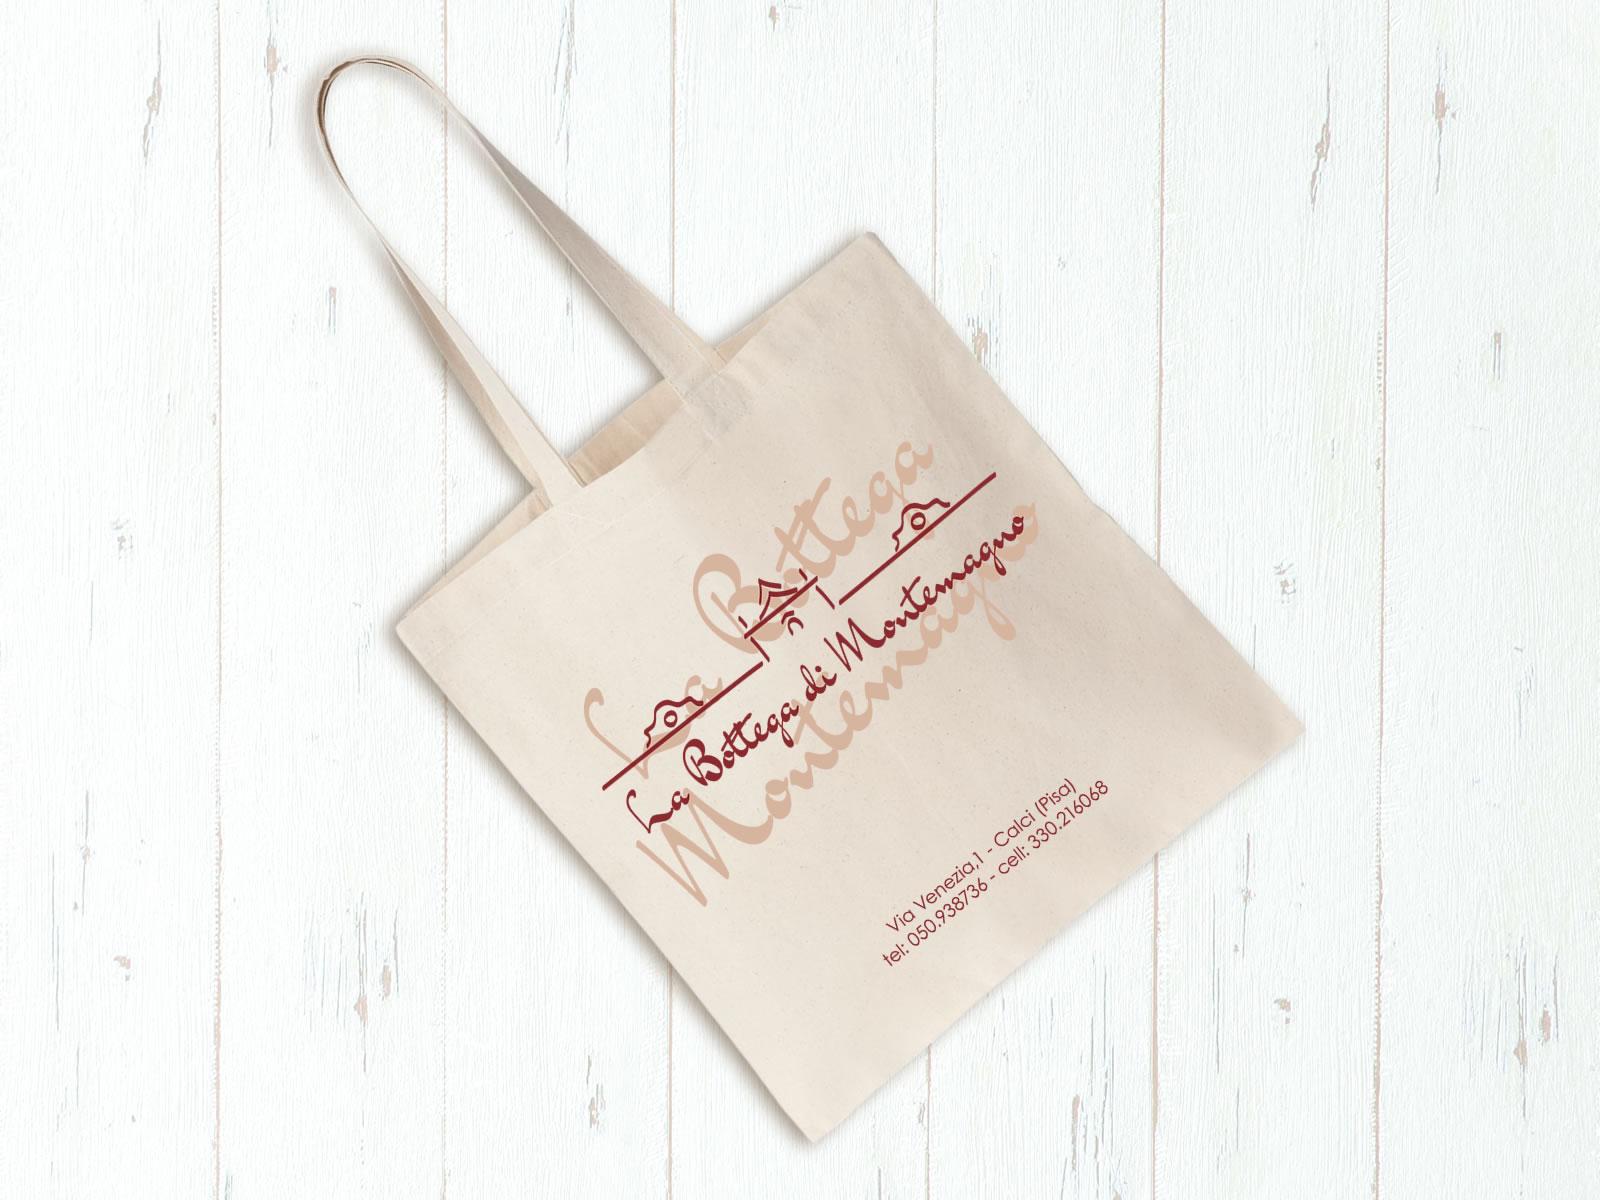 La Bottega di Montemagno - Shopping bag